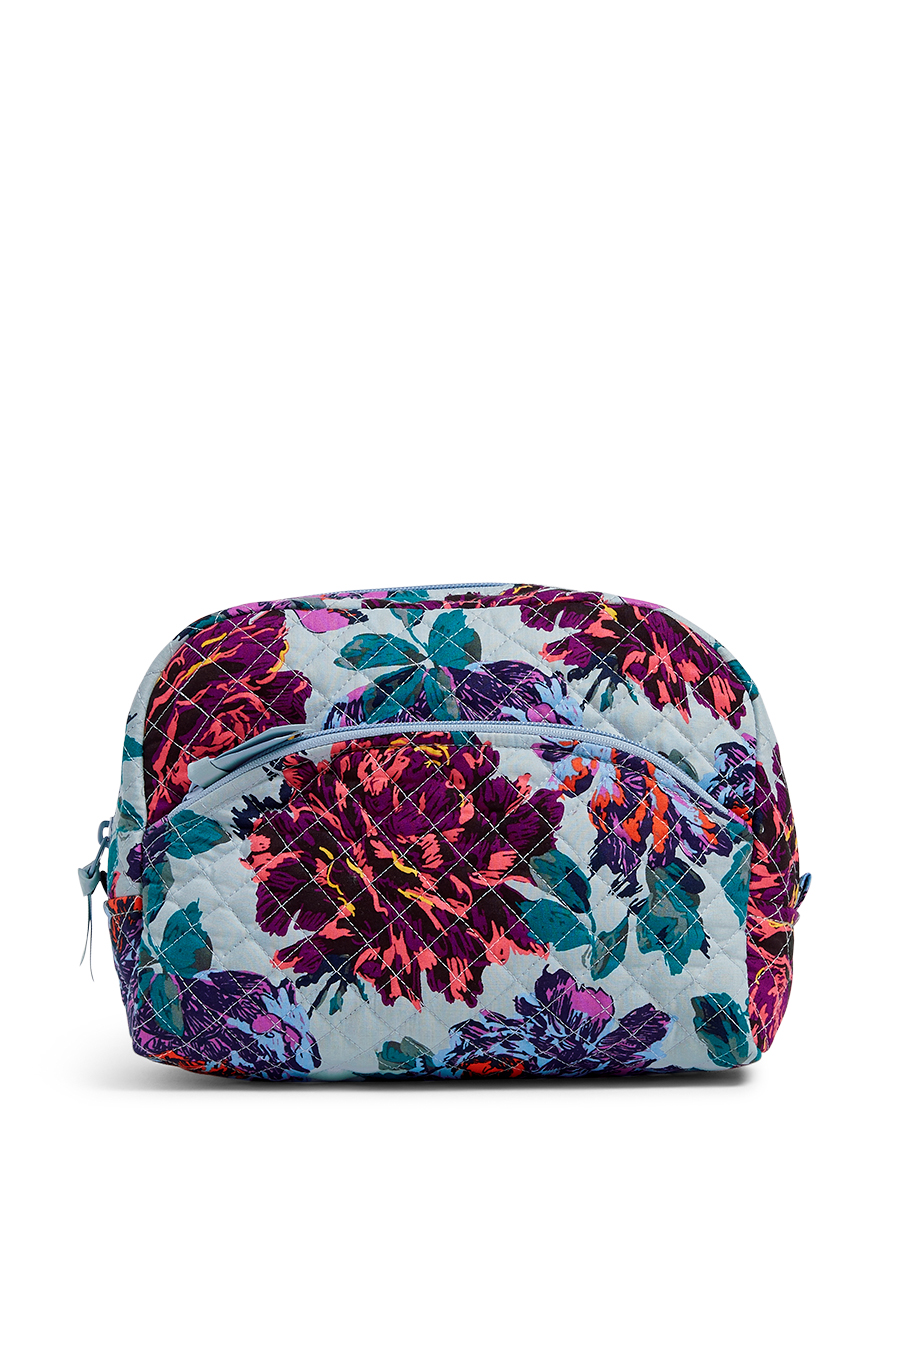 Vera Bradley Vera Bradley Large Cosmetic Bag Walmart Com Walmart Com